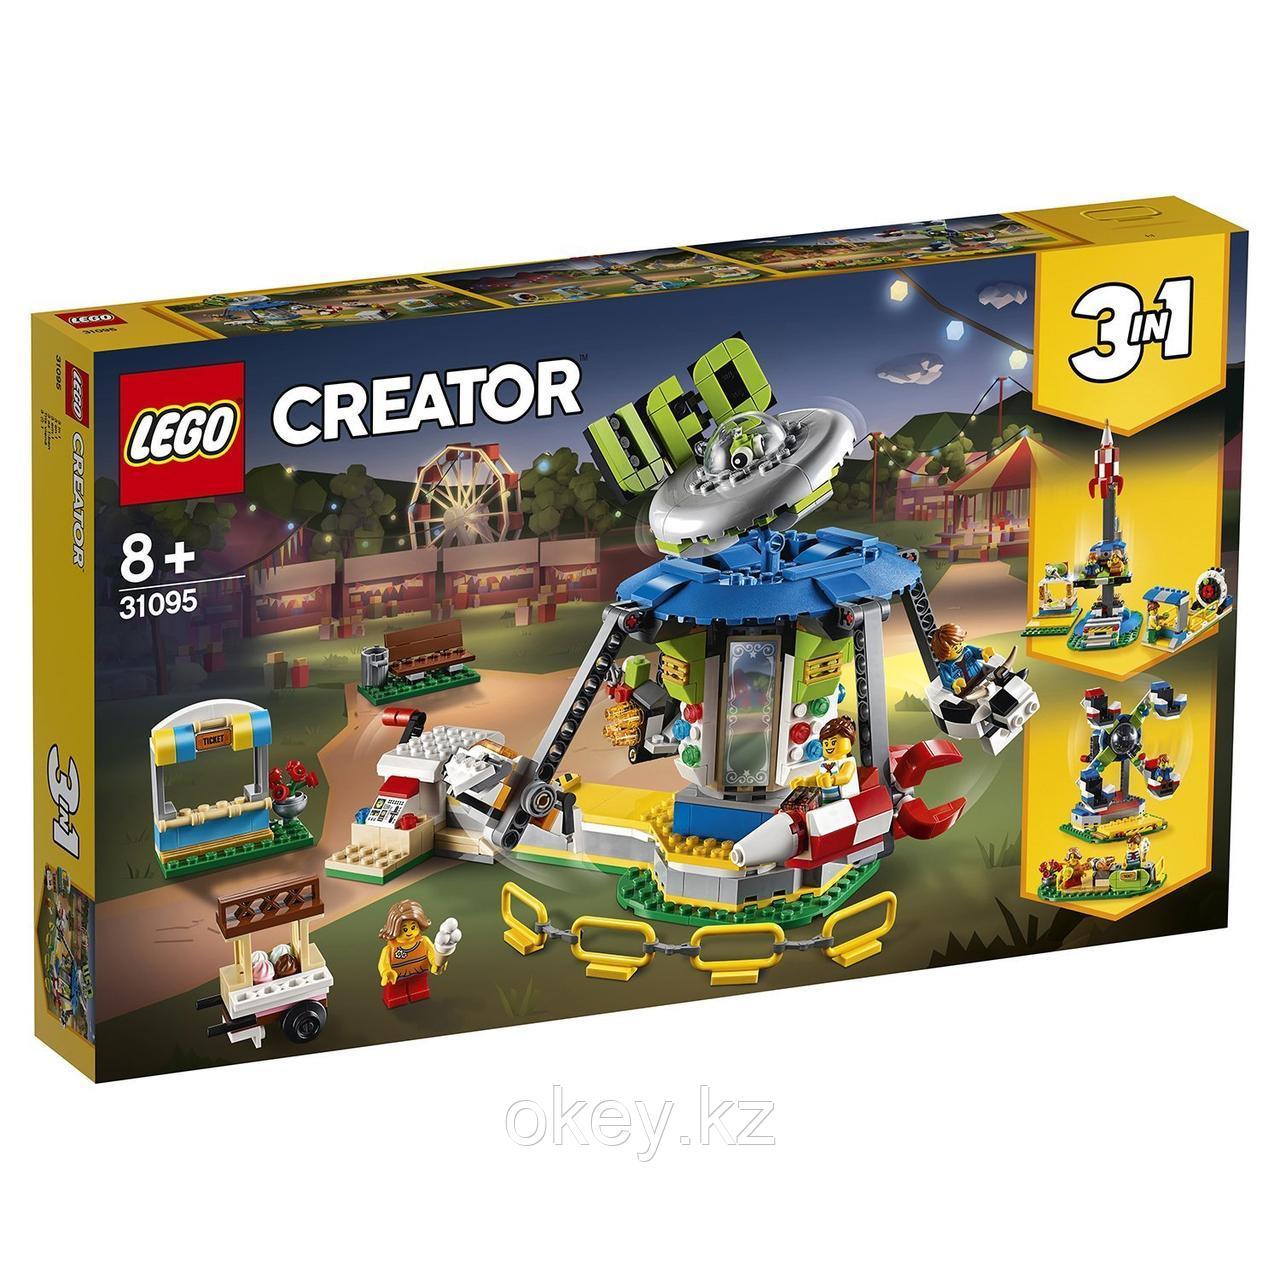 LEGO Creator: Ярмарочная карусель 31095